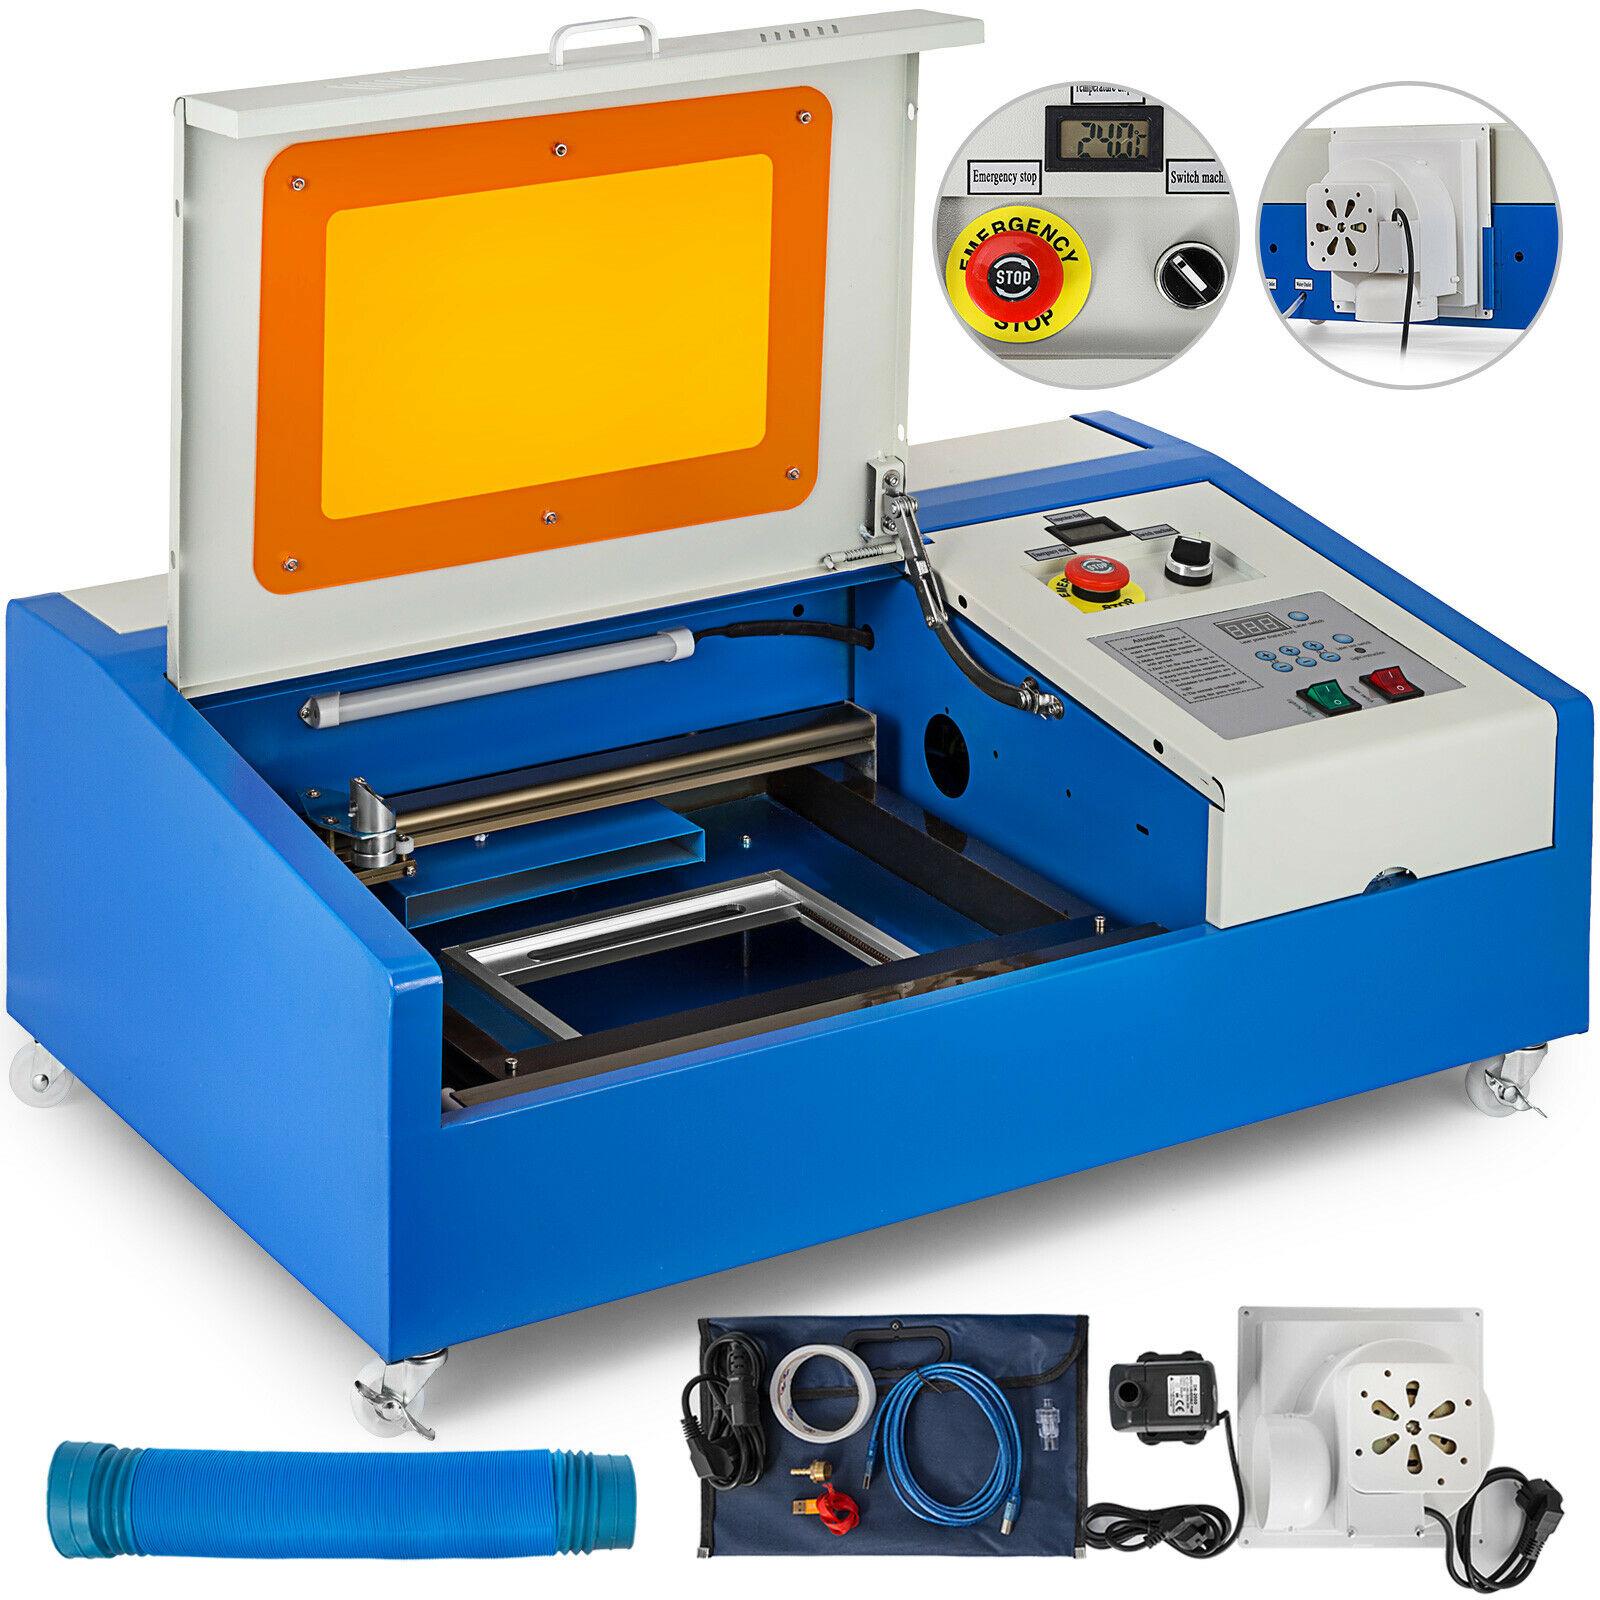 Free shipping New USB CO2 CO2 Laser Engraving Cutting Machine laser engraver 220V/110V 40W